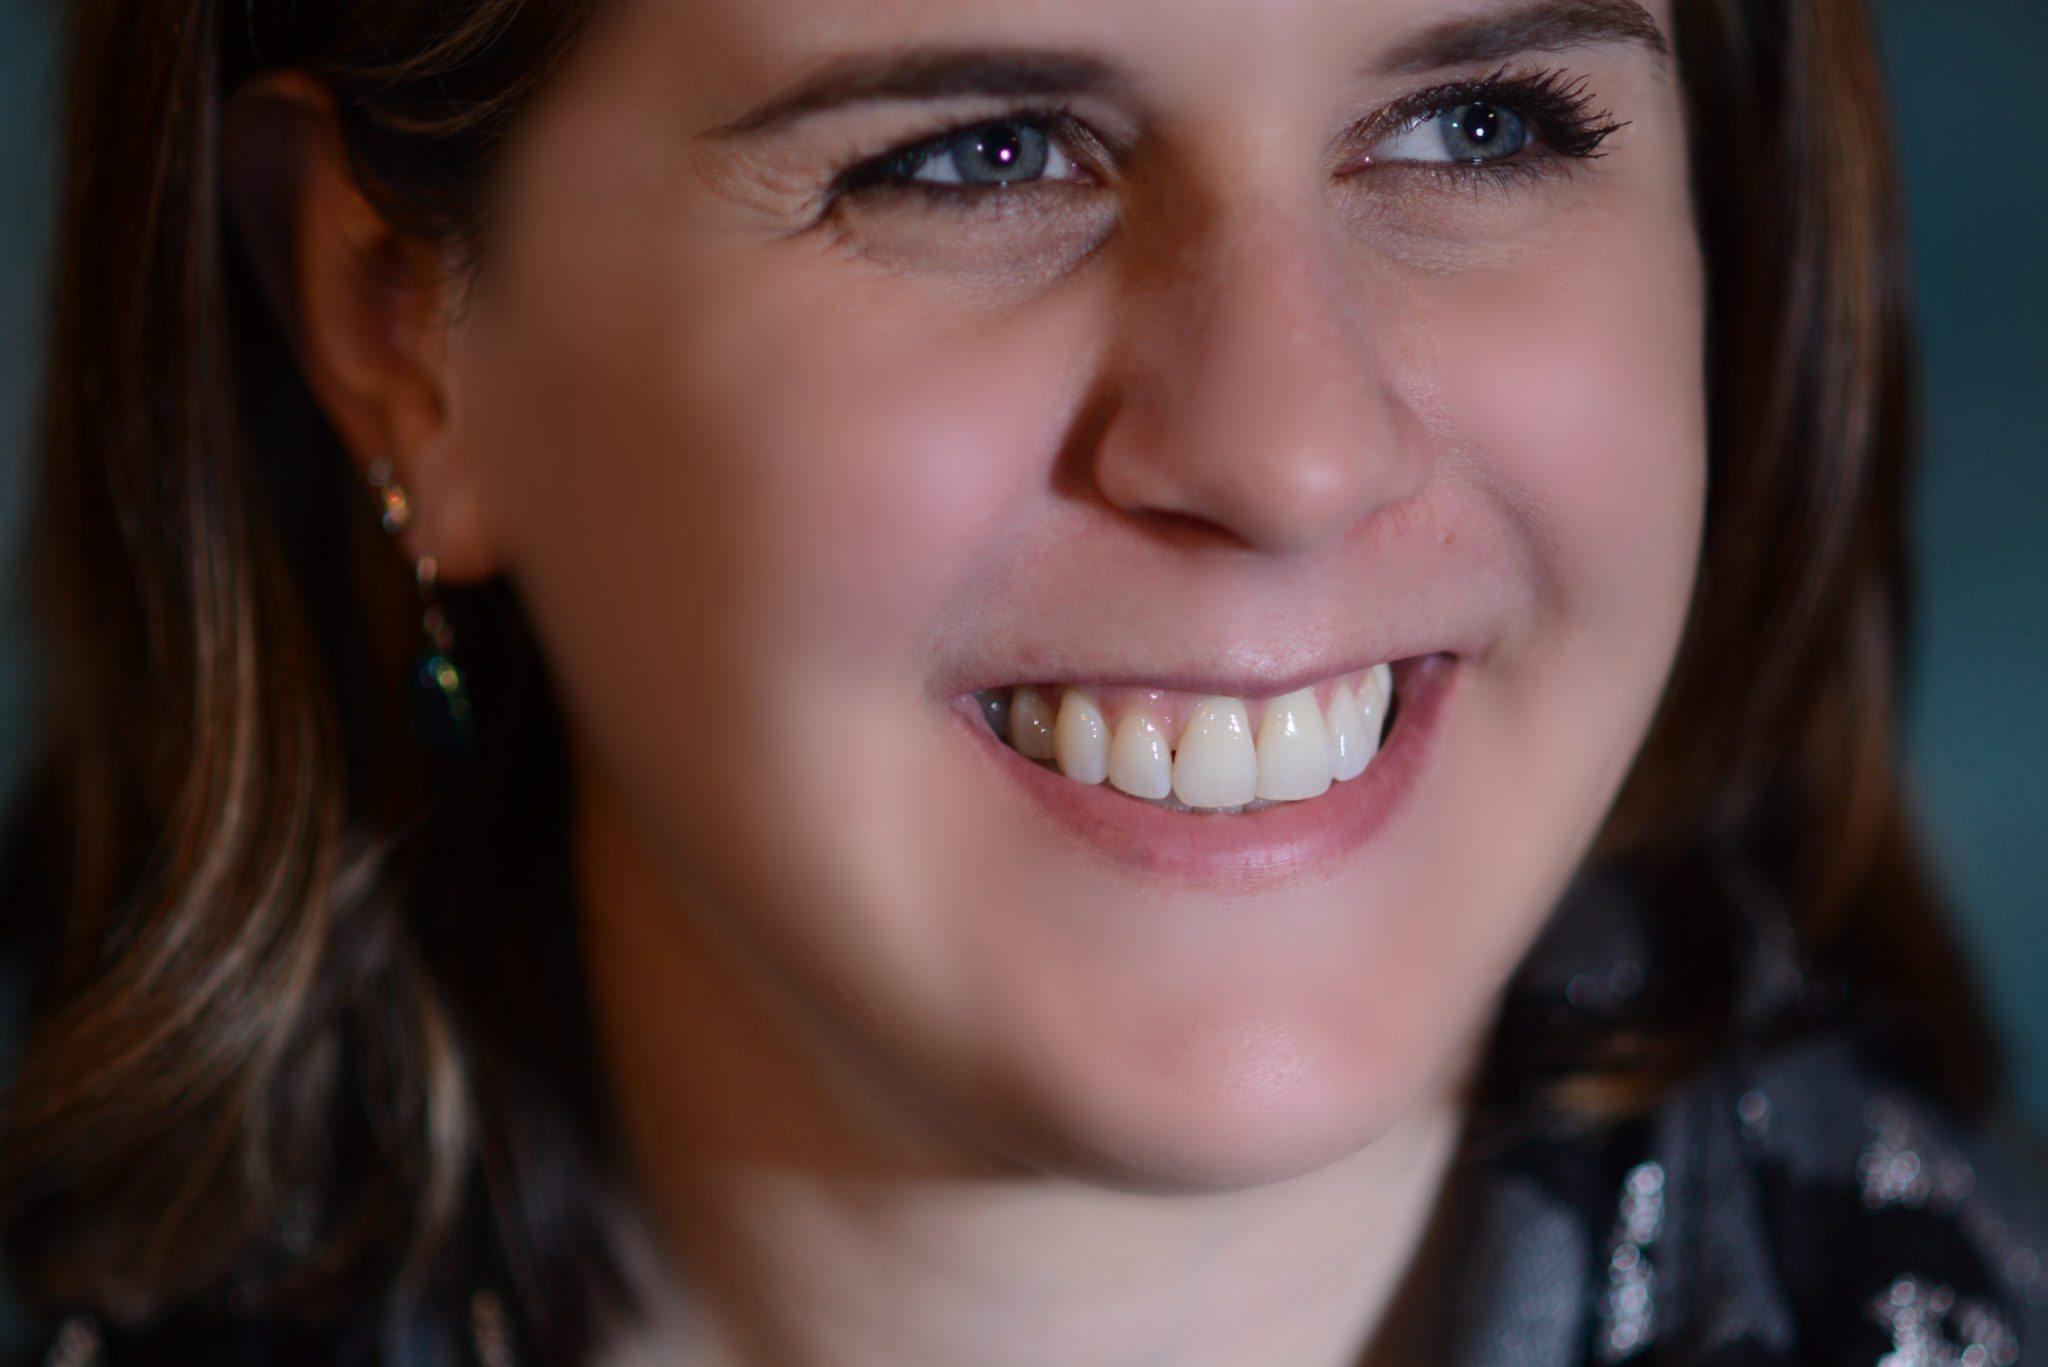 Amy Martin smiles at Seasons of Smiles Dental